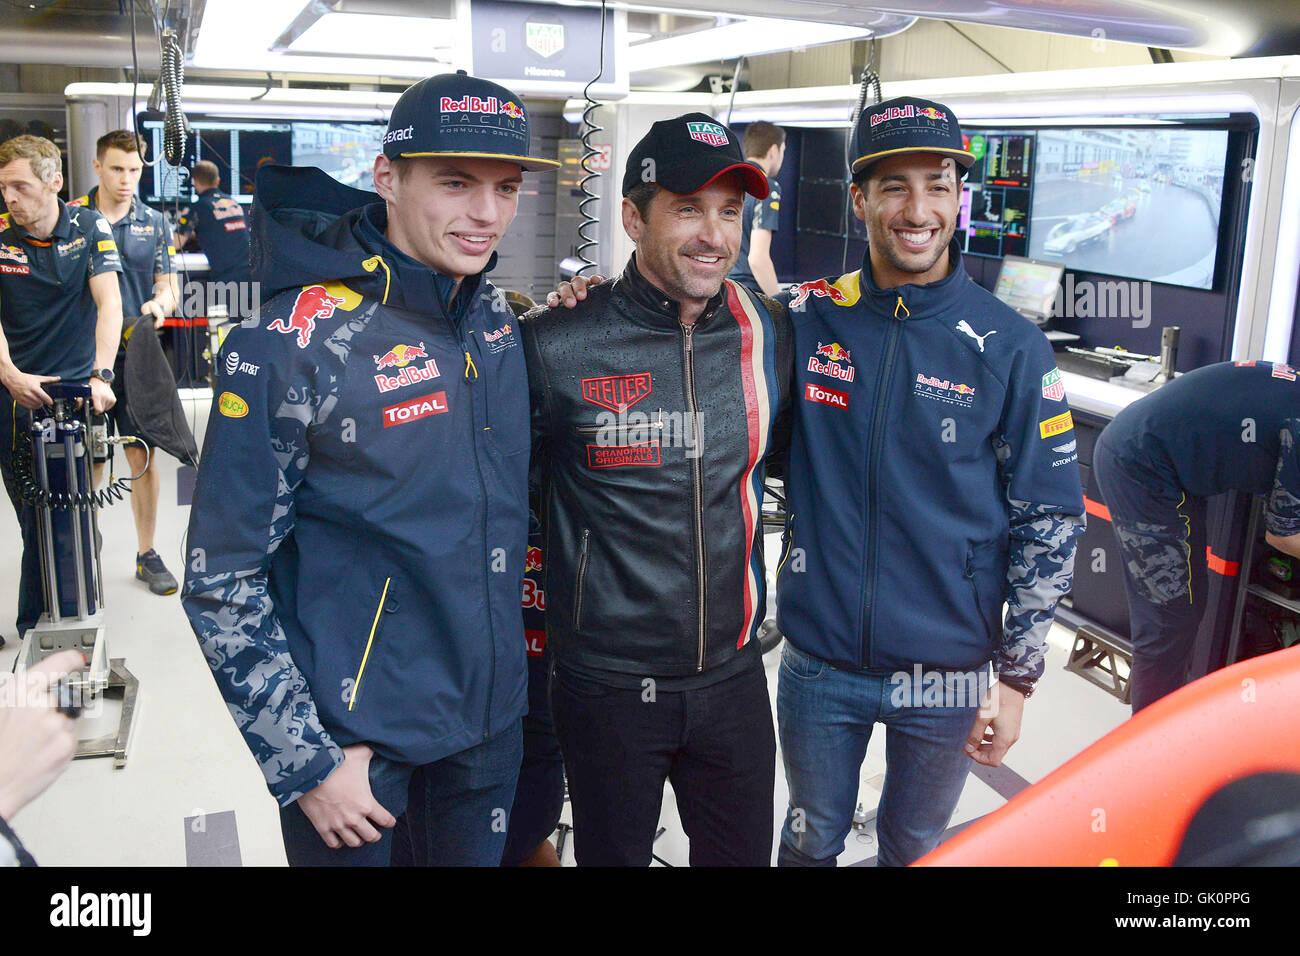 2016 Formula One Monaco Grand Prix Featuring Max Verstappen Stock